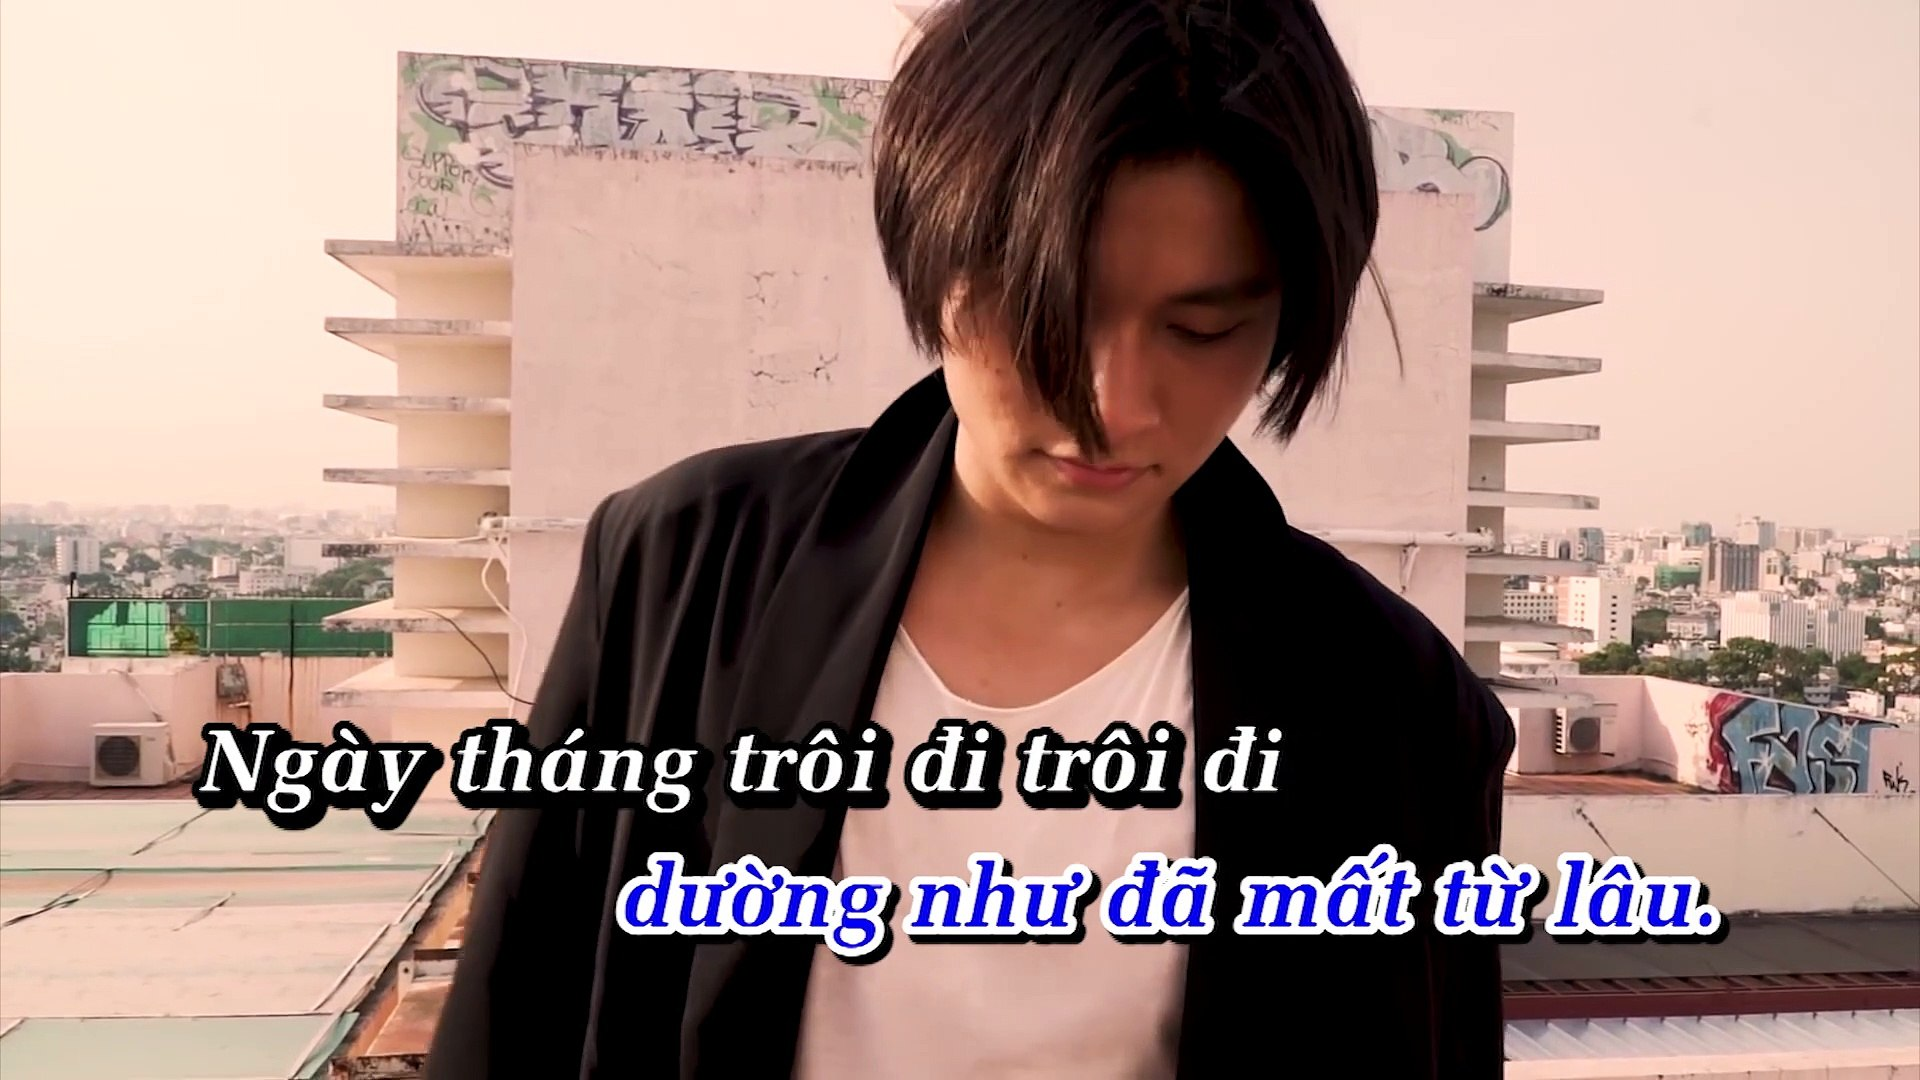 [Karaoke] Vệt Nắng (Piano Version) - Bảo Thạch [Beat]